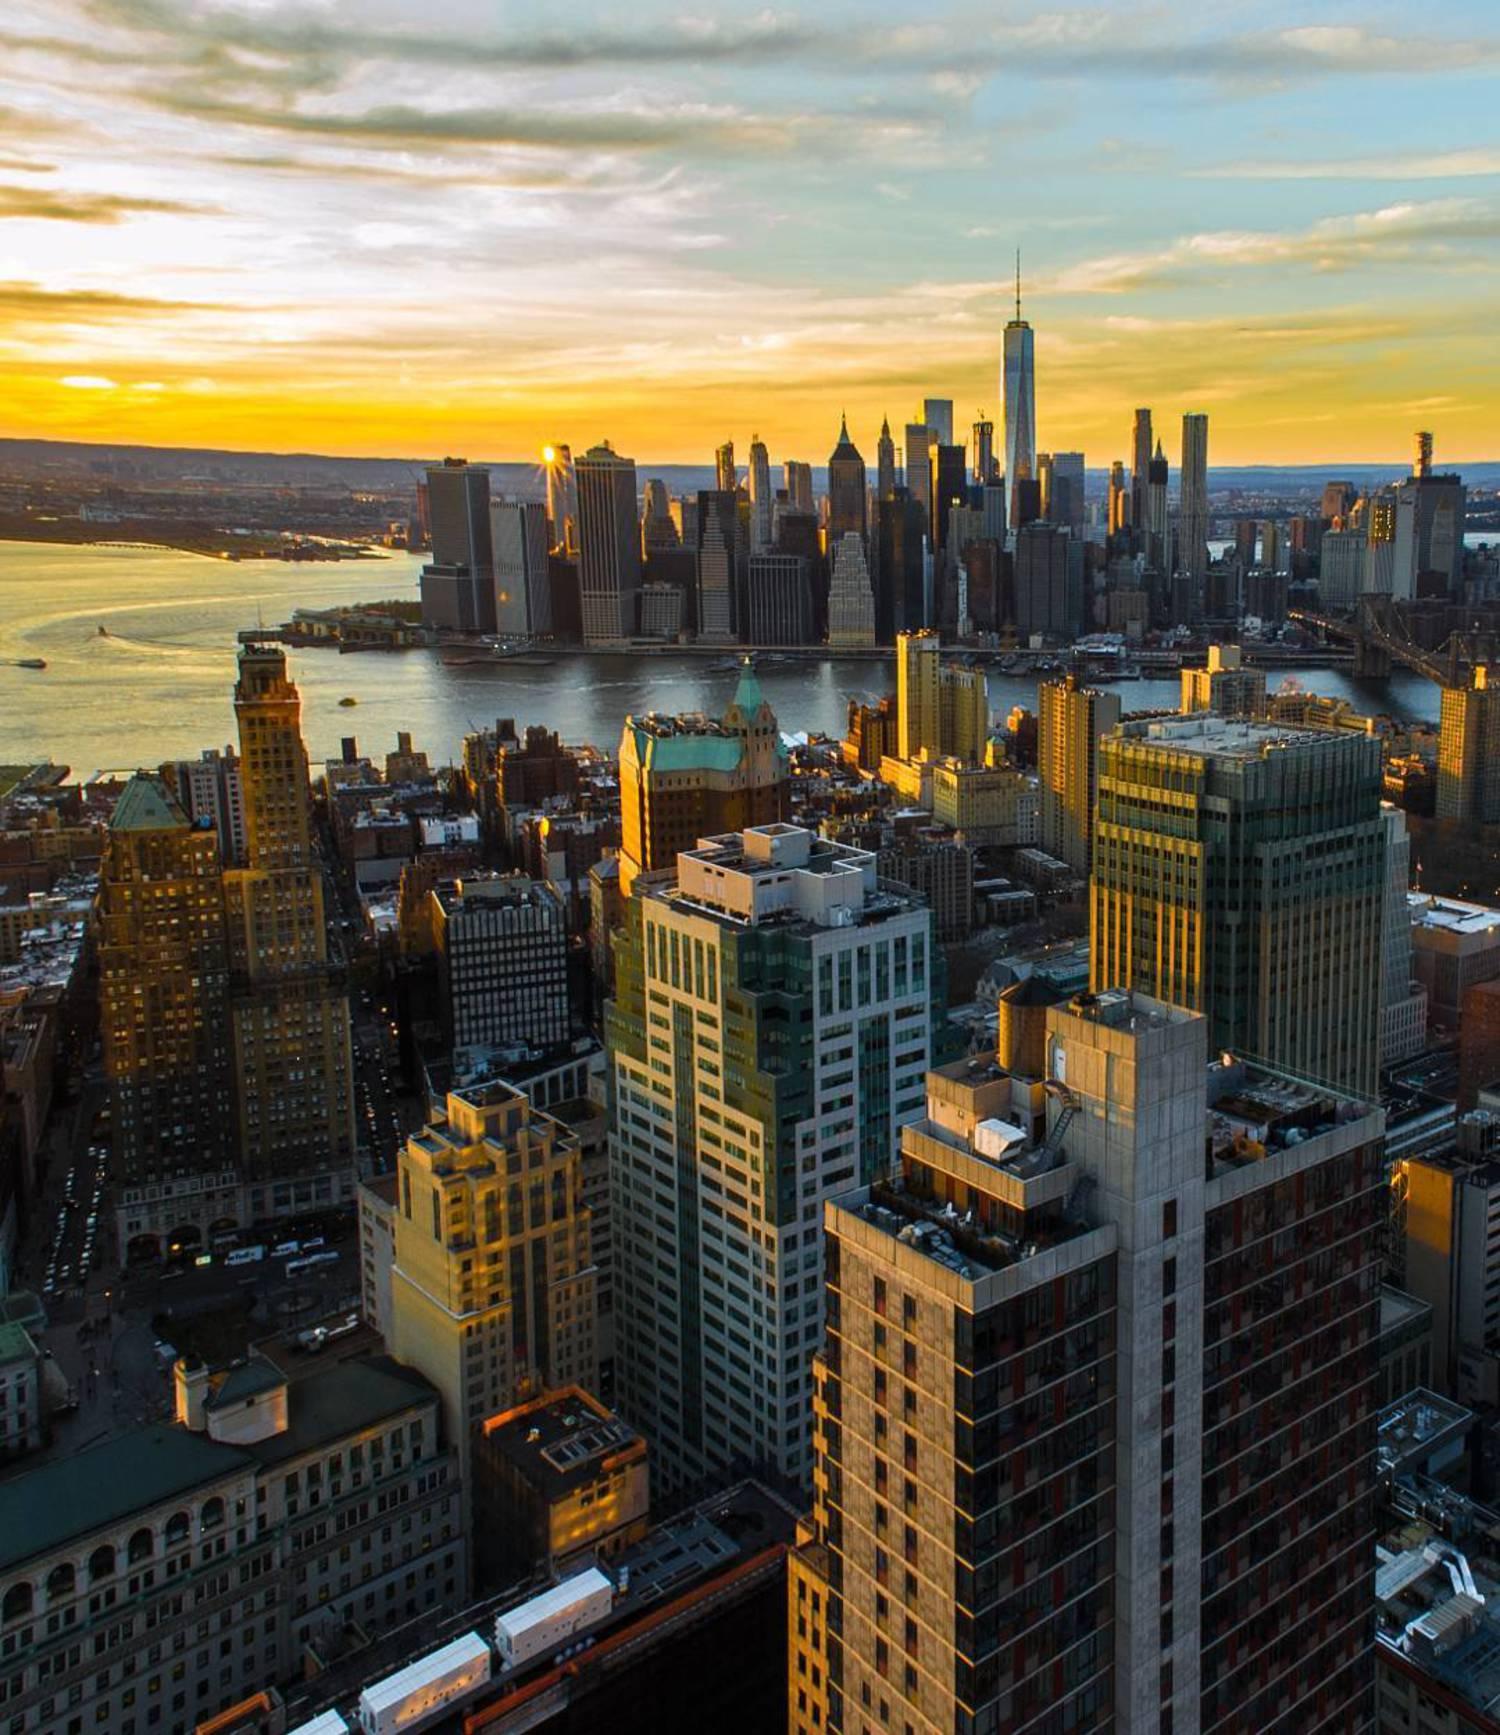 """The imagination is the golden pathway to everywhere"". ~Terence McKenna . #weekly_feature #wonderful_places #shotaward #nbc4ny #newyorkcity #igersmood #newyork_originals #cbviews #igworldclub #shotzdelight #heatercentral #ig_worldclub #huffpostgram #ig_dynamic #citylife #global_hotshotz #instagramnyc #illgrammers #igmasters #exklusive_shot #fatalframes #worldbestshot#icapture_nyc #worldshotz #citykillerz #newyork_instagram #sunset_vision"